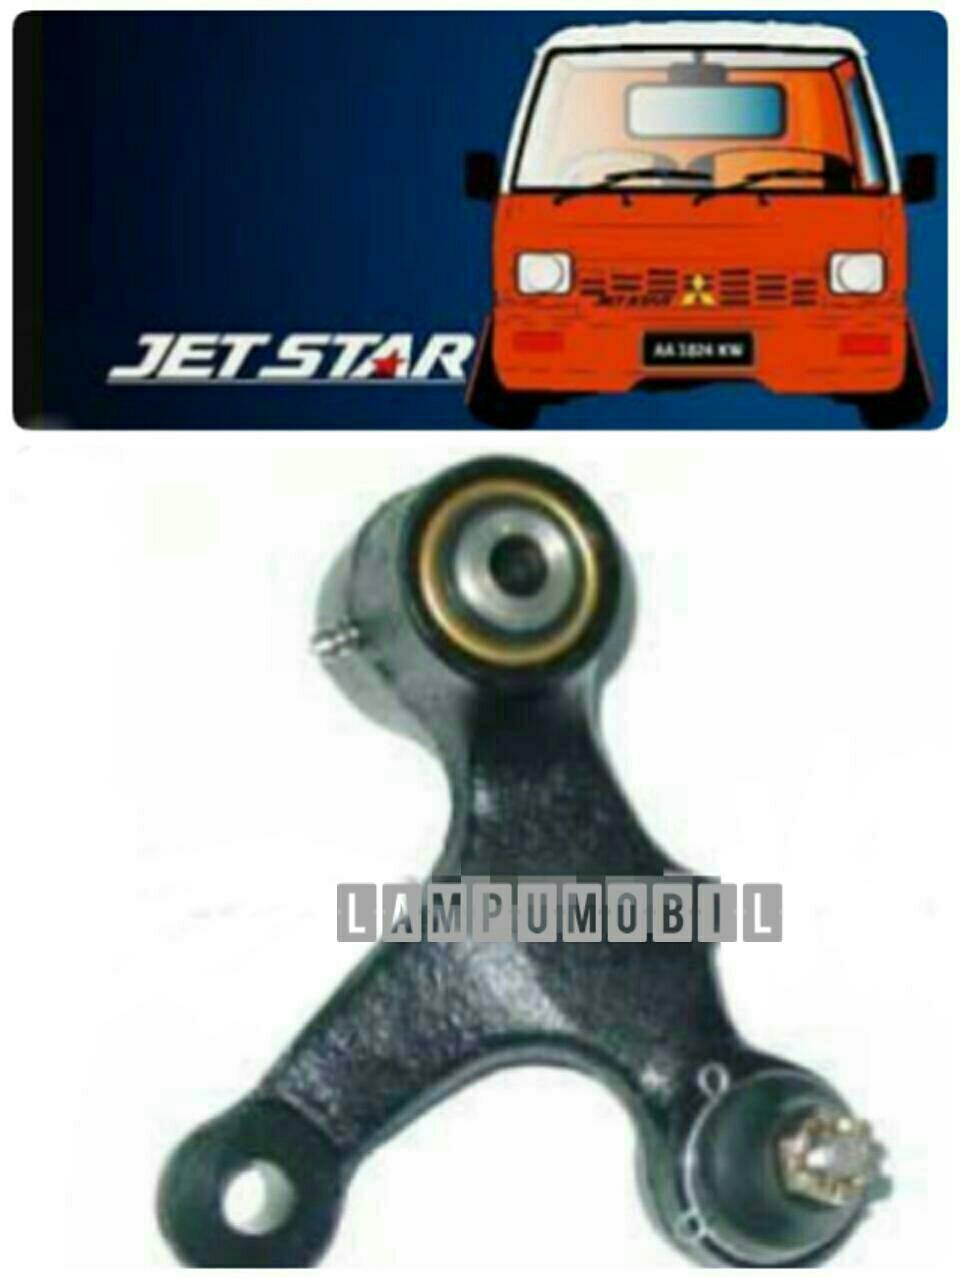 harga Bell Crank Mitsubishi Jetstar Tokopedia.com